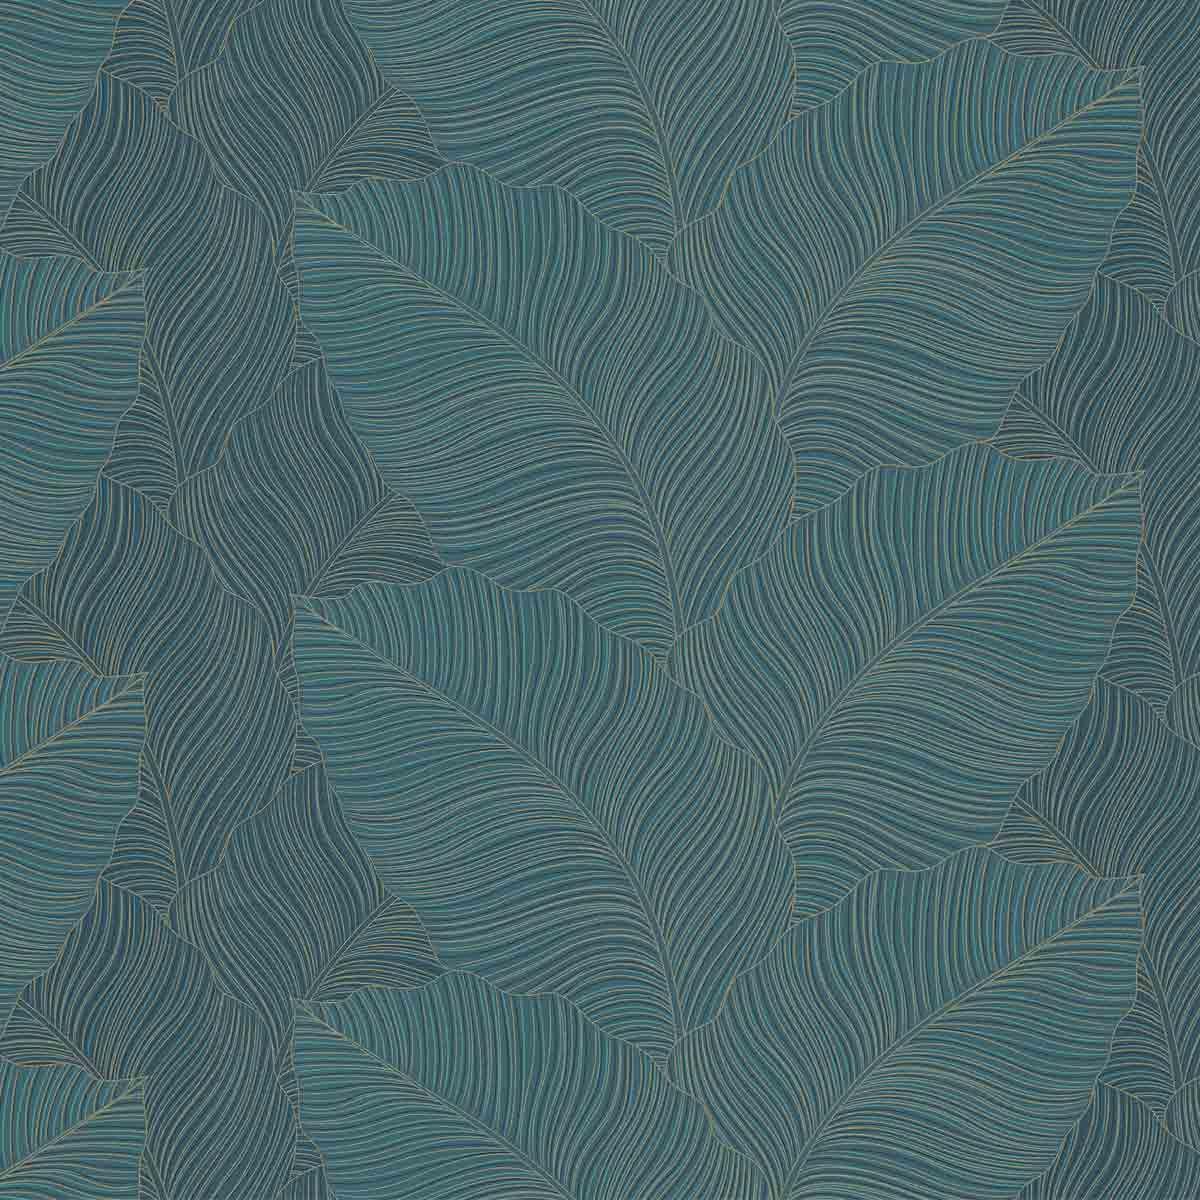 Papier Peint Palme Bleu Vert Dore Tulla Intisse